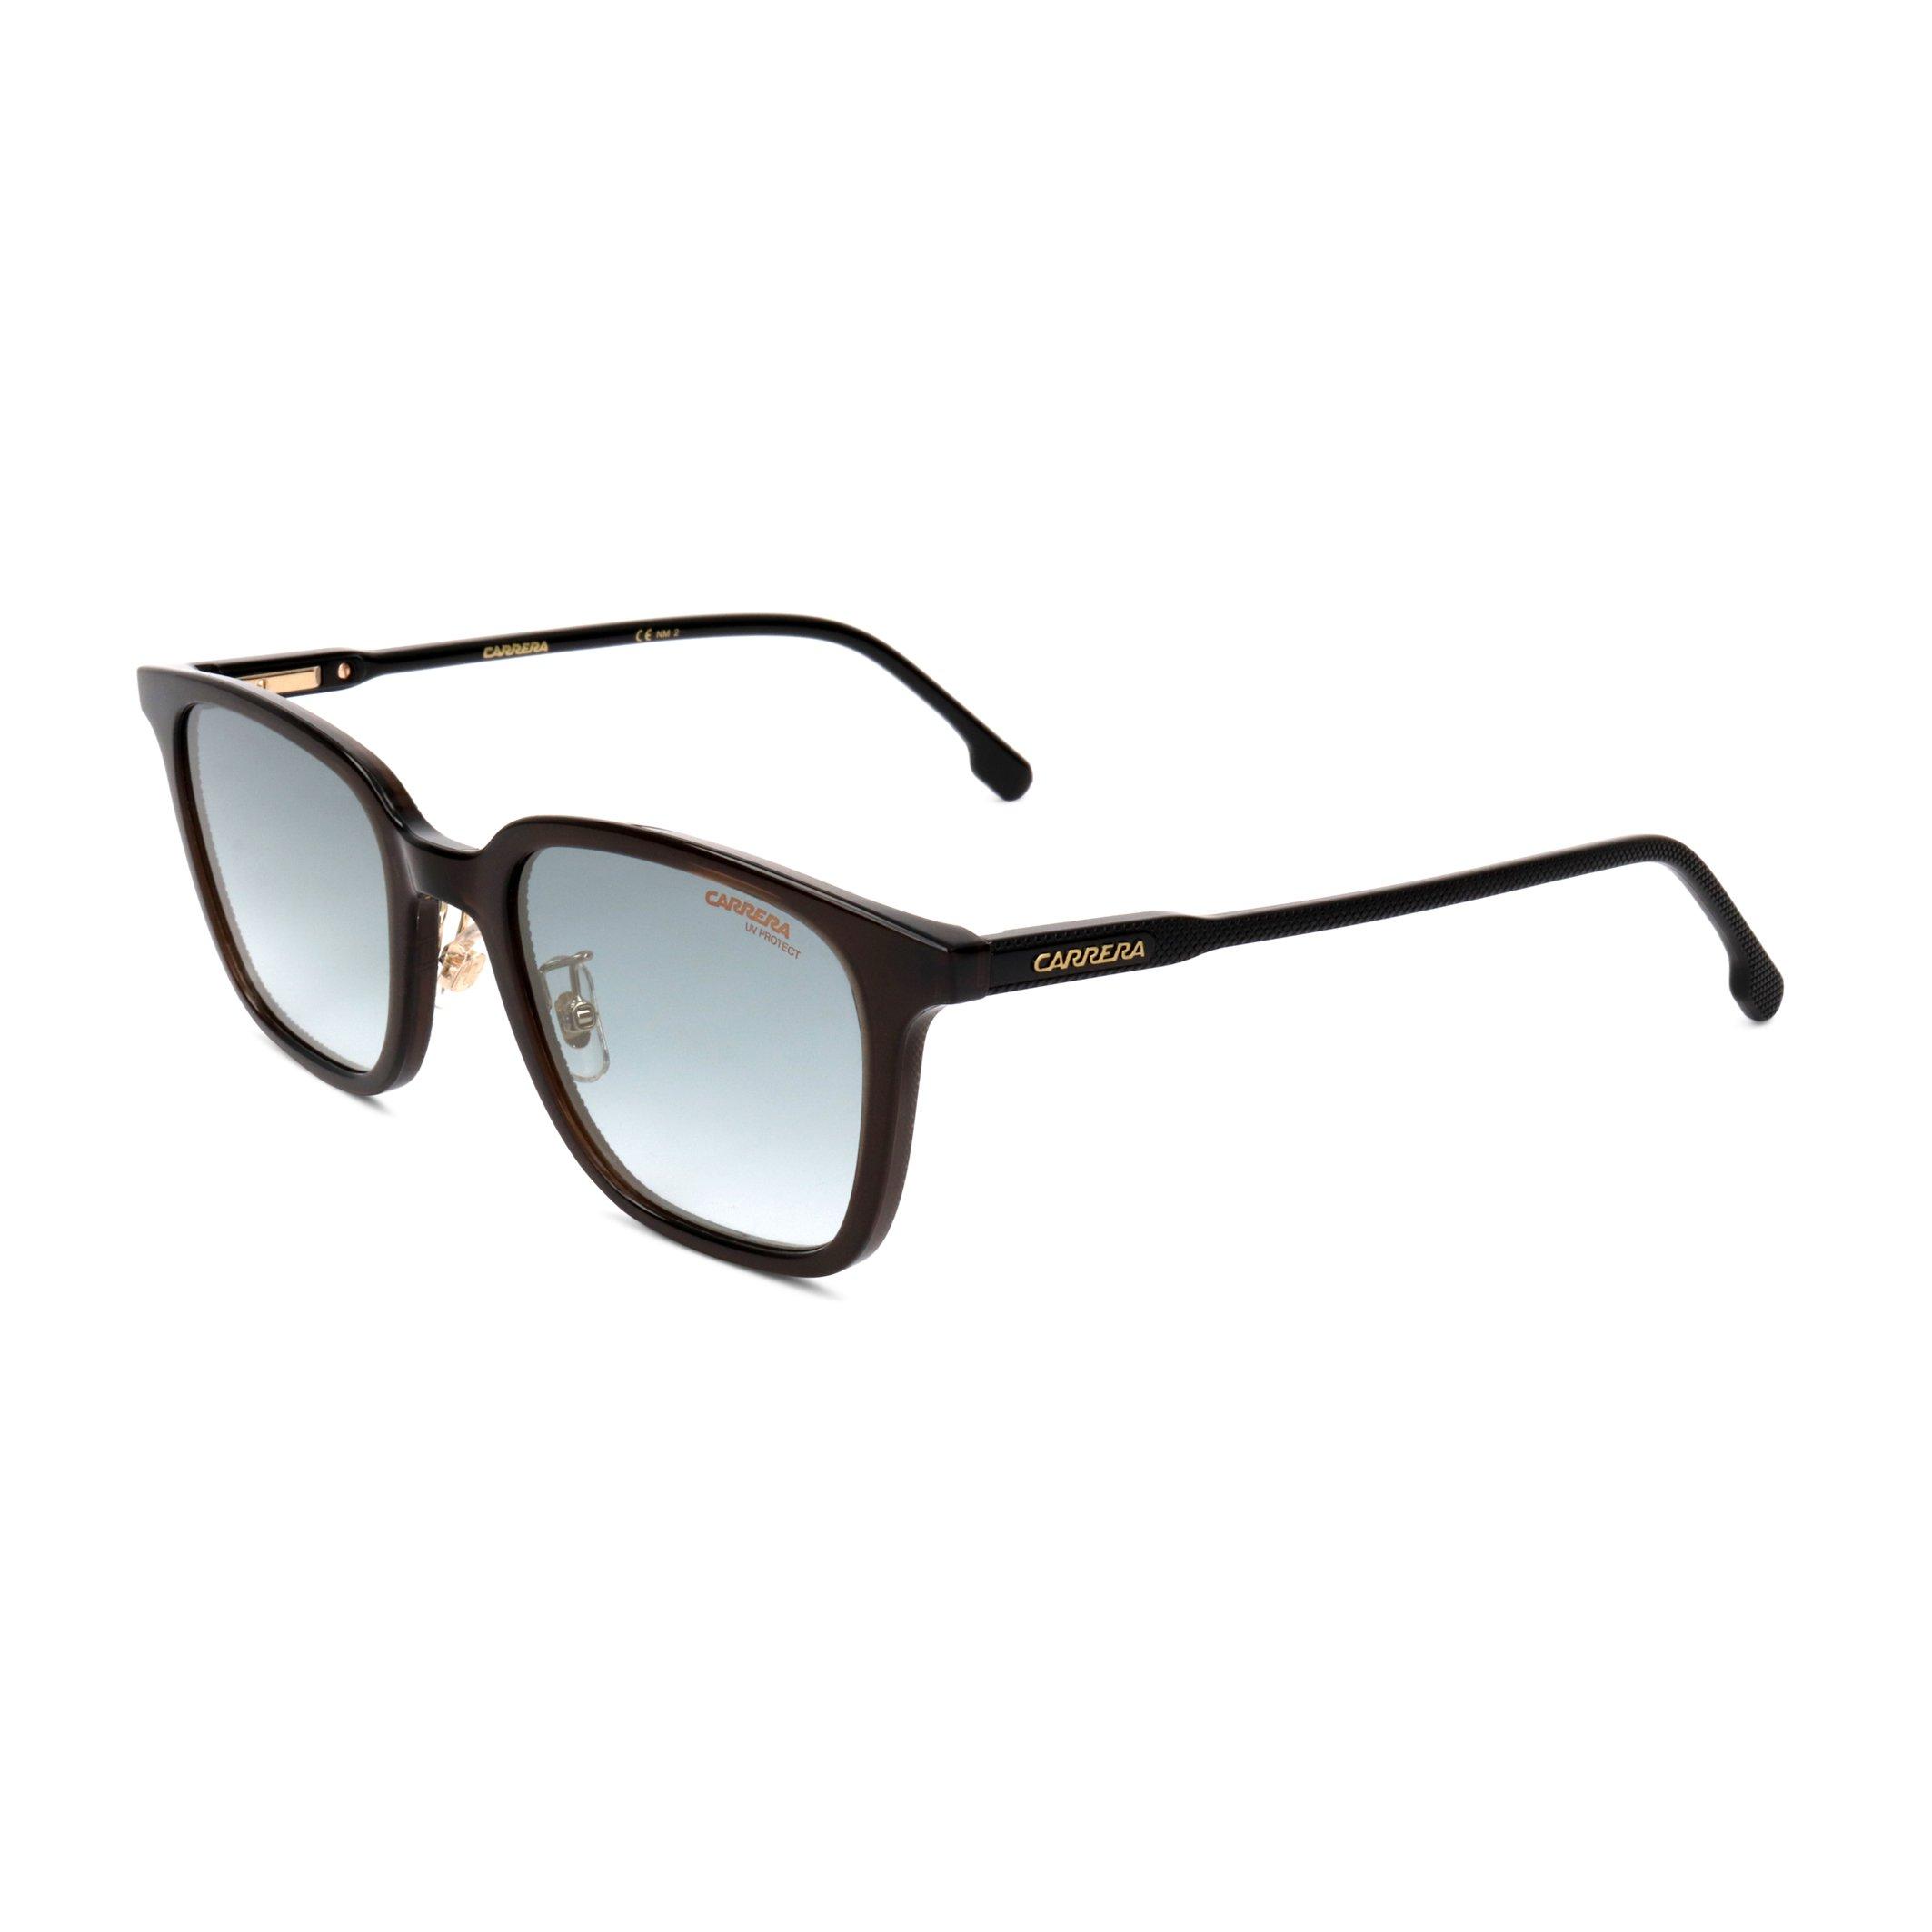 Carrera Unisex Sunglasses Brown CARRERA_232GS - brown-1 NOSIZE